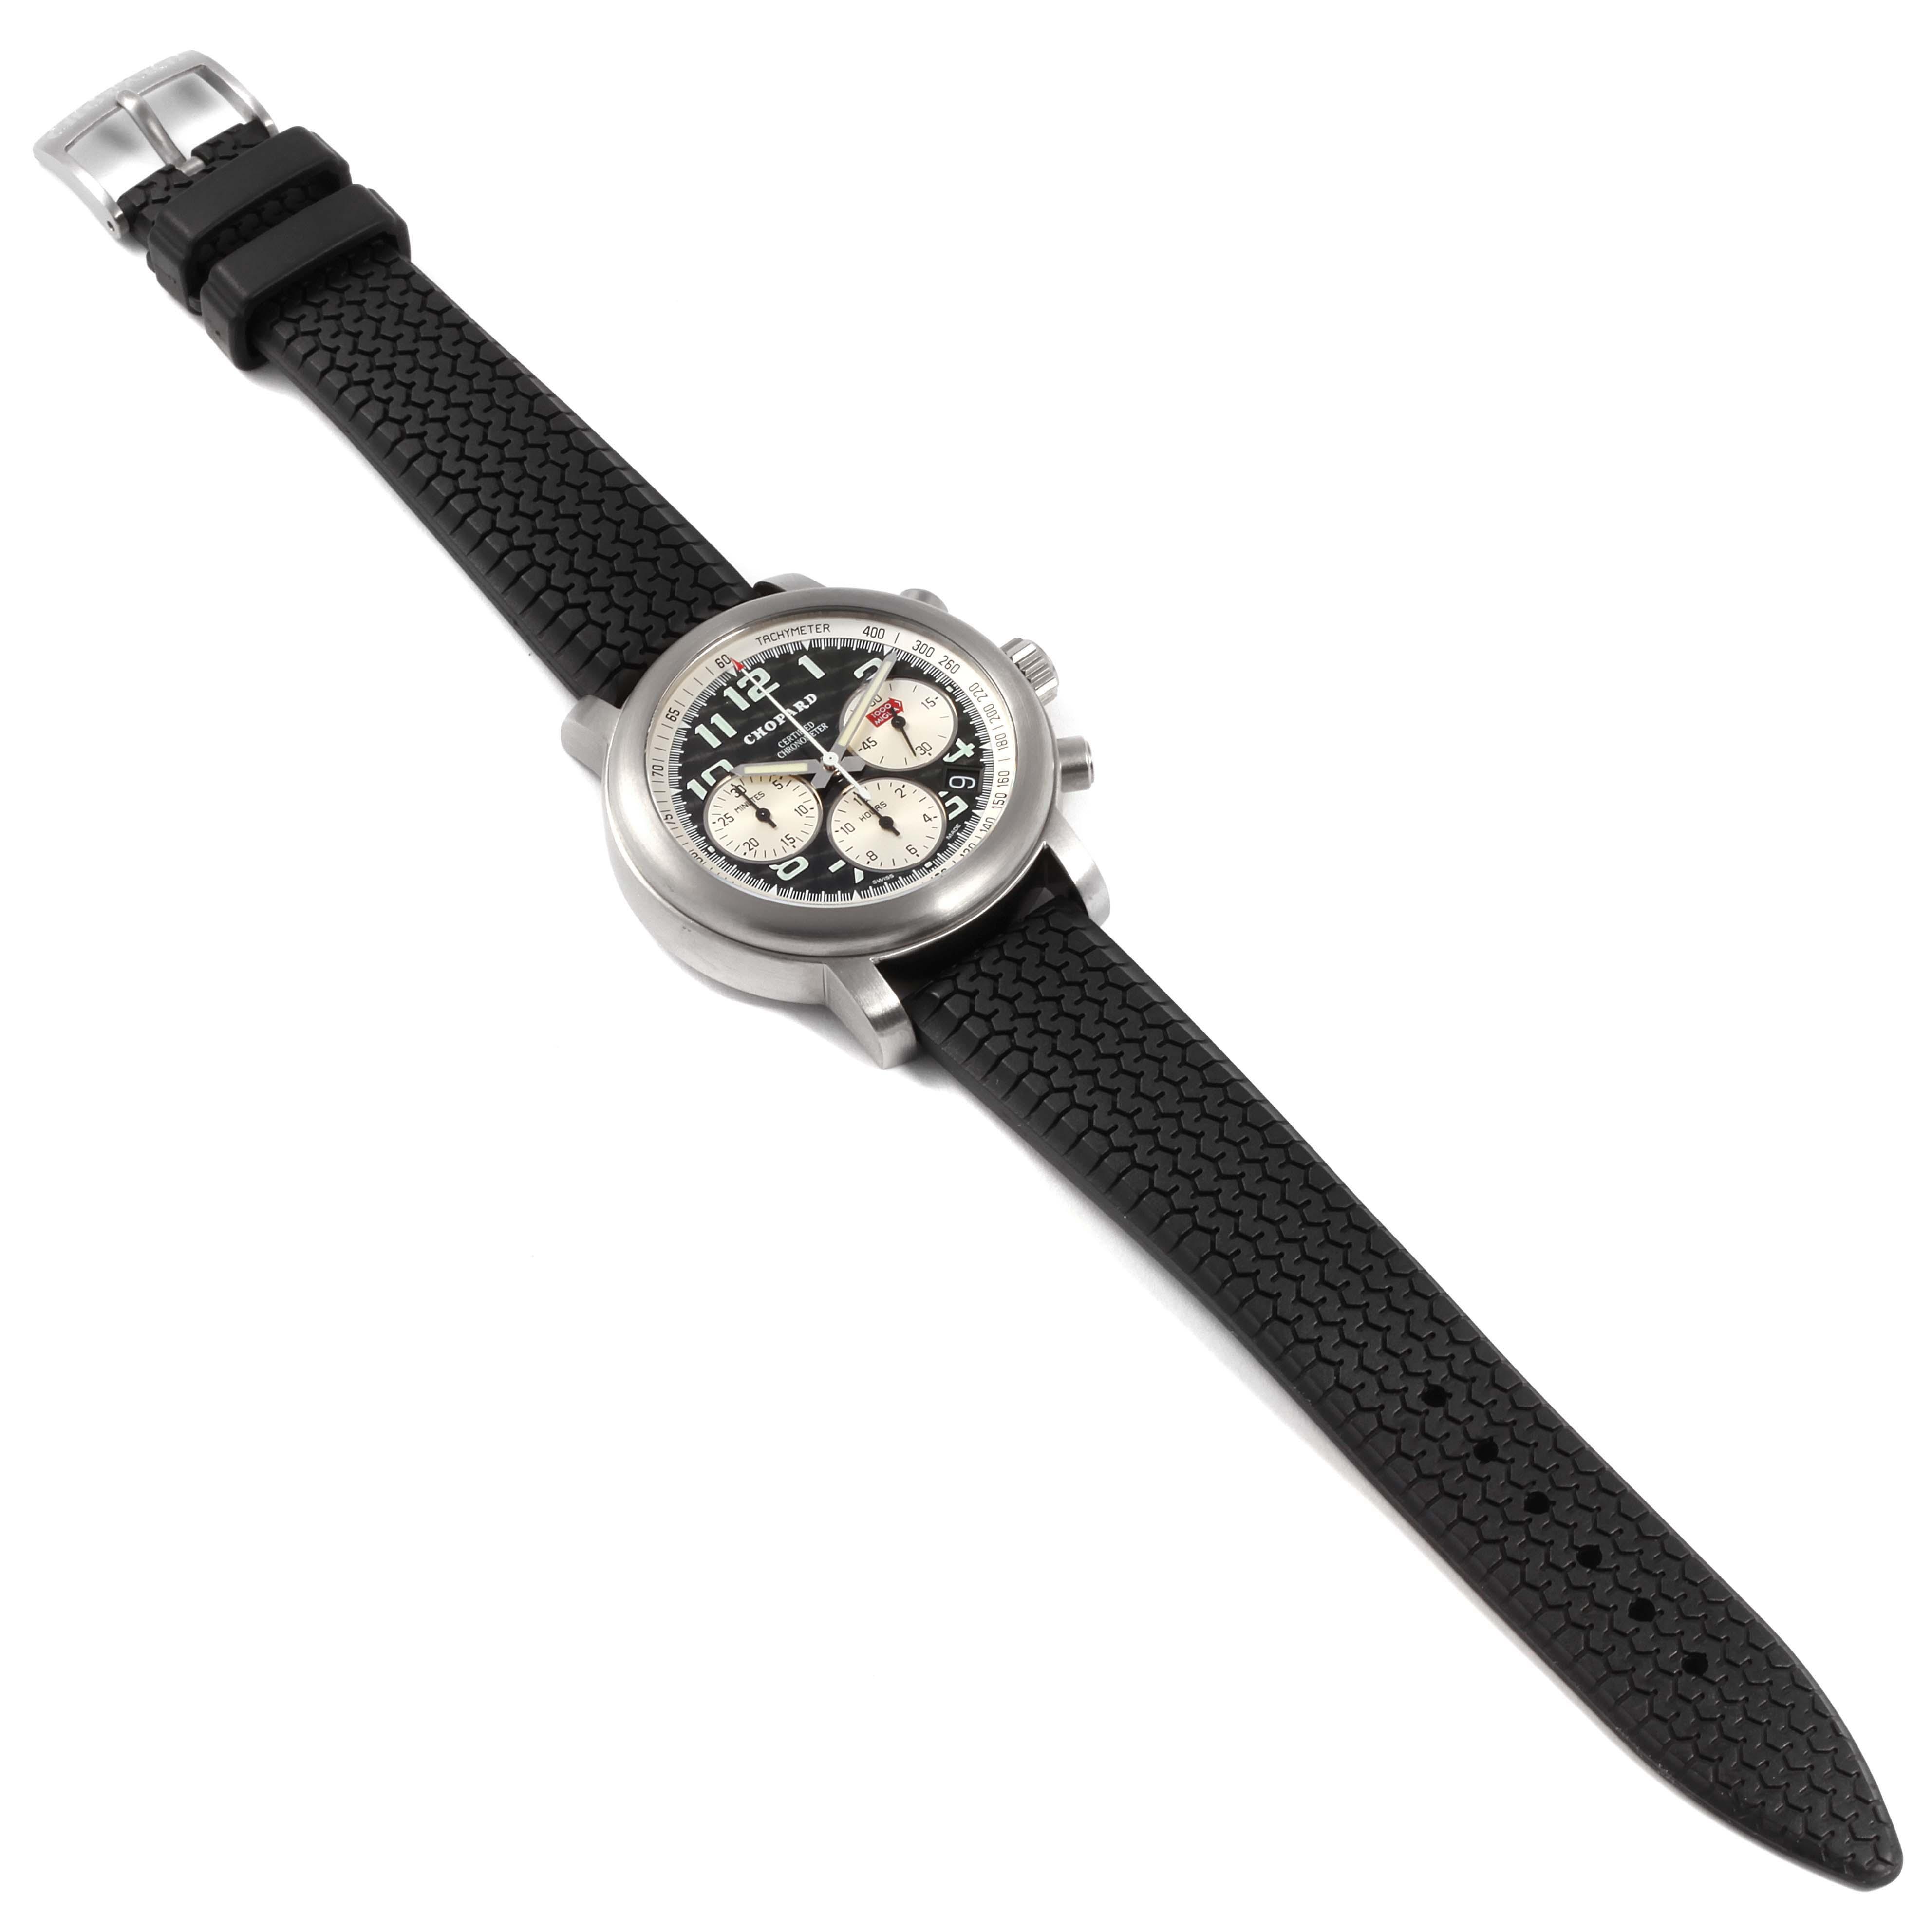 Chopard Happy Mille Miglia Titanium Chronograph Mens Watch 8407 SwissWatchExpo